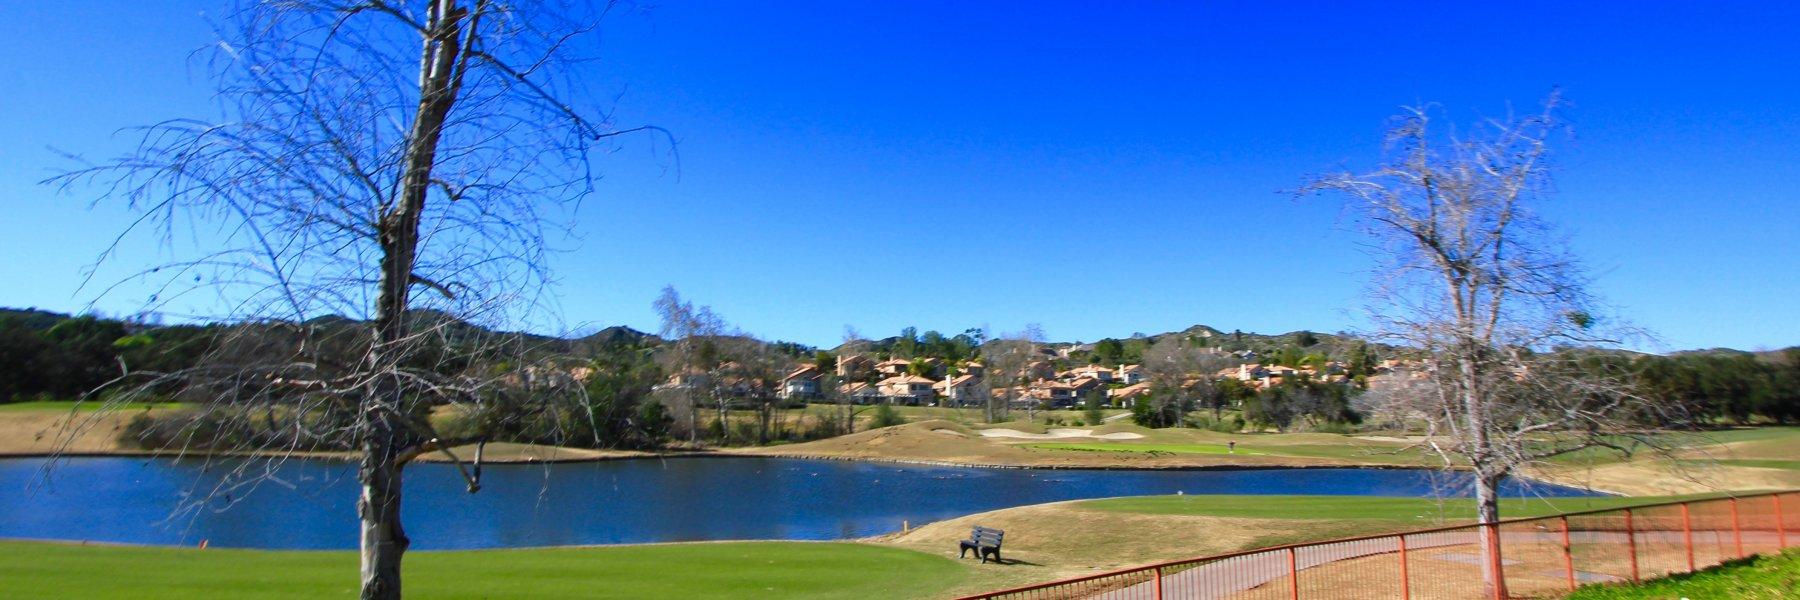 Terraces is a community of homes in Coto de Caza, California